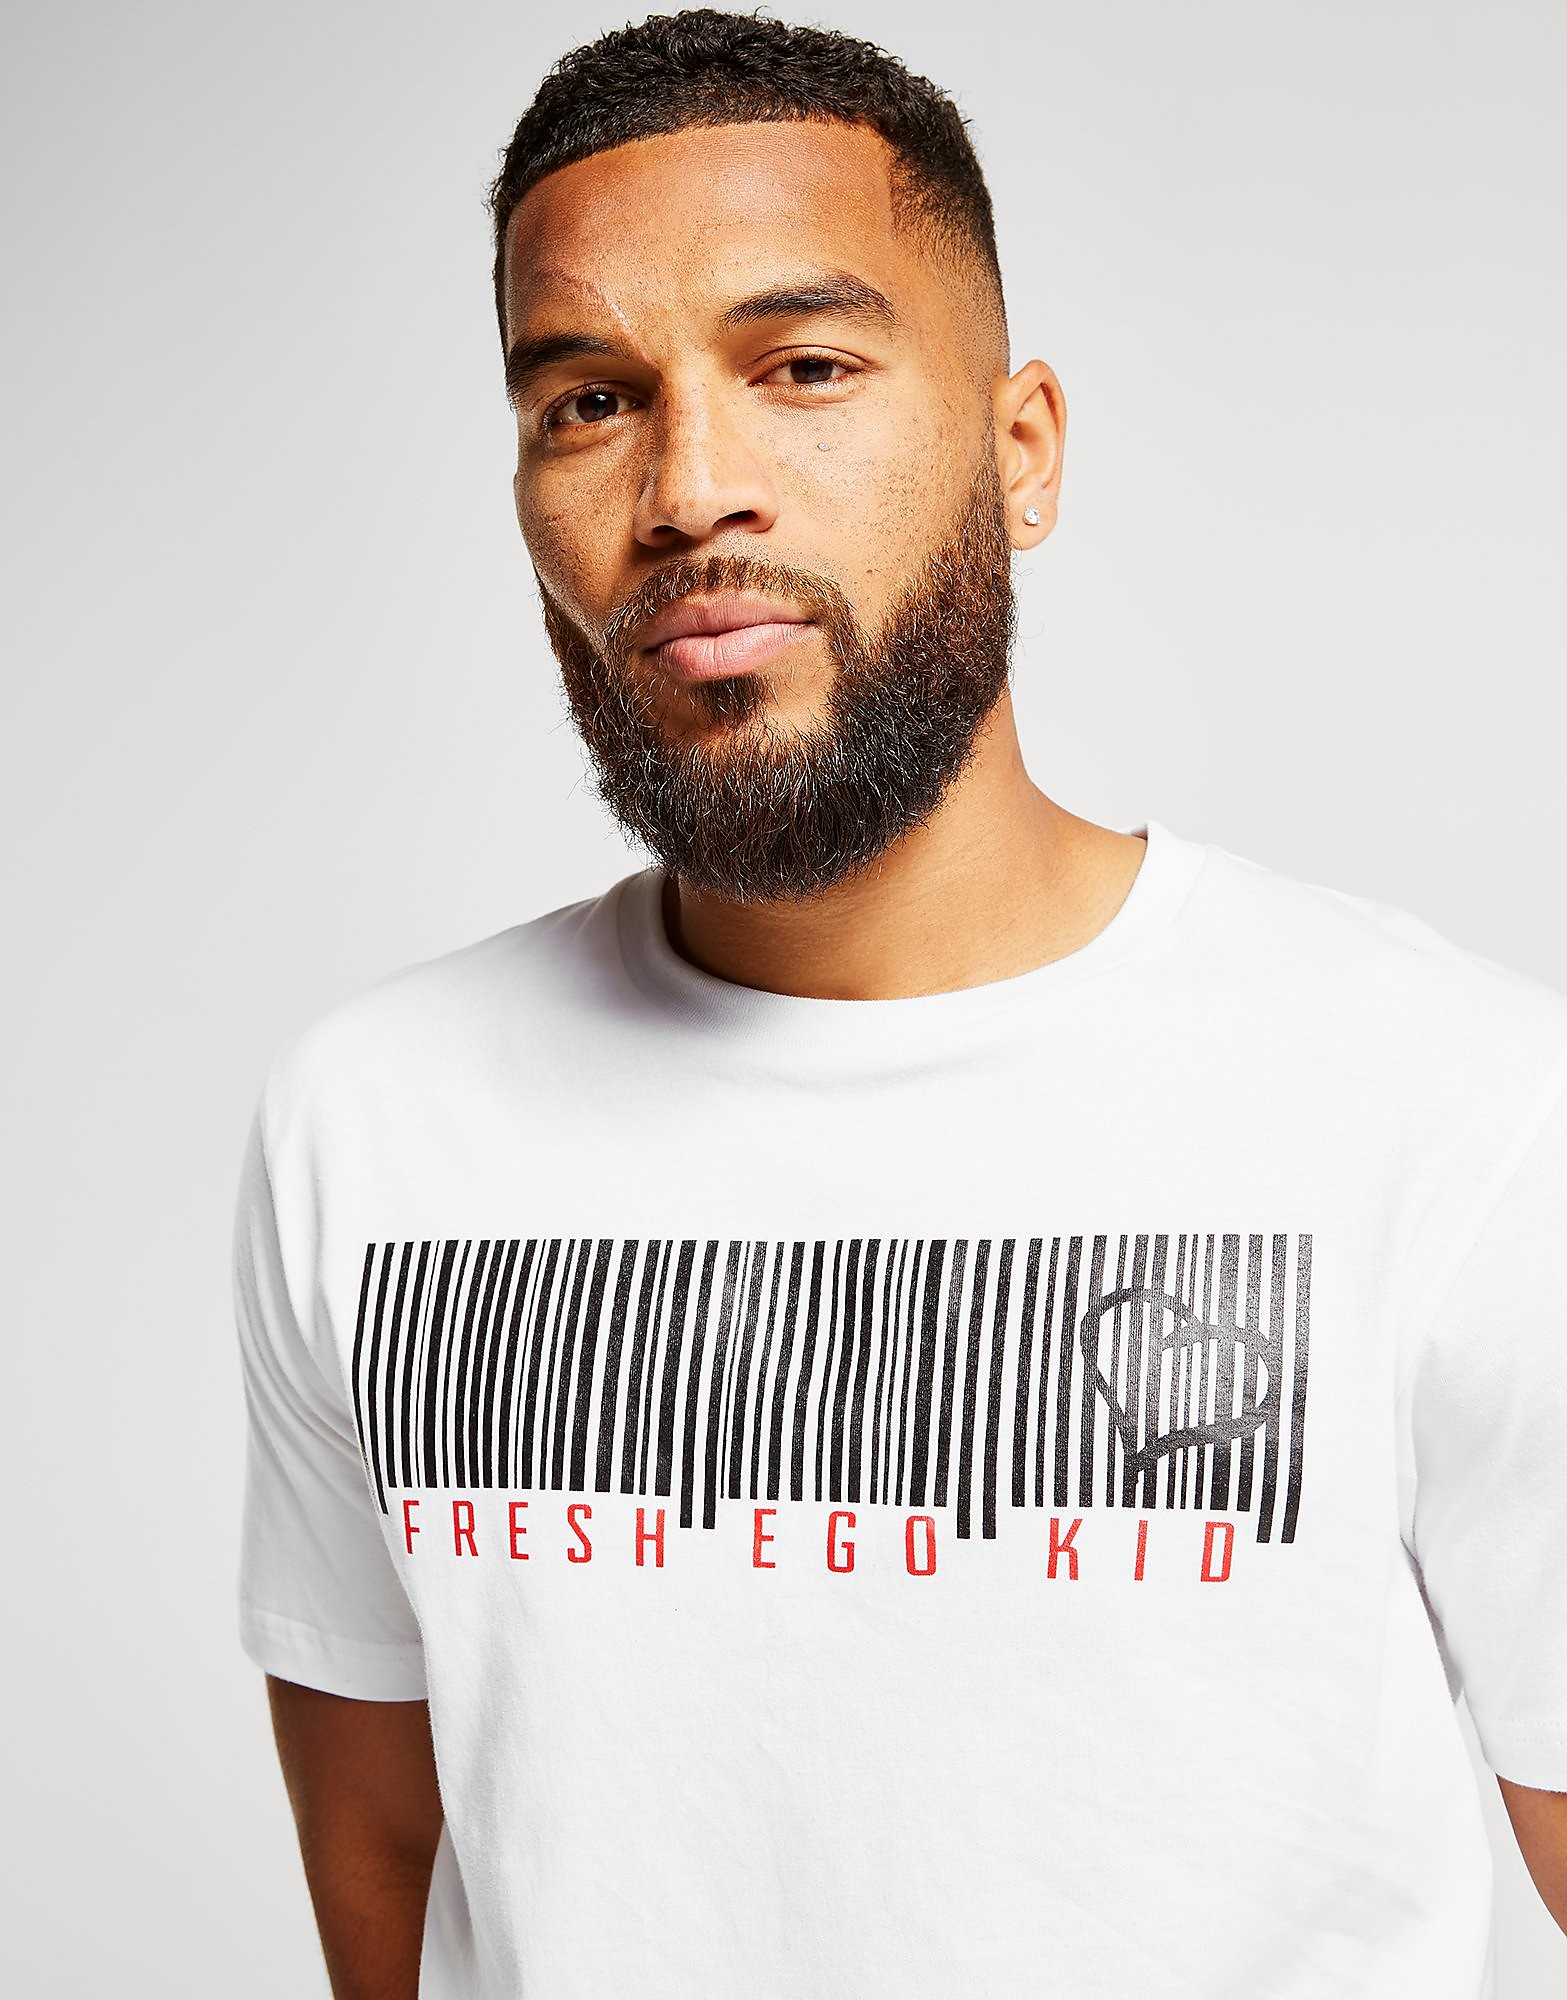 Fresh Ego Kid Barcode T-Shirt Heren - Wit - Heren